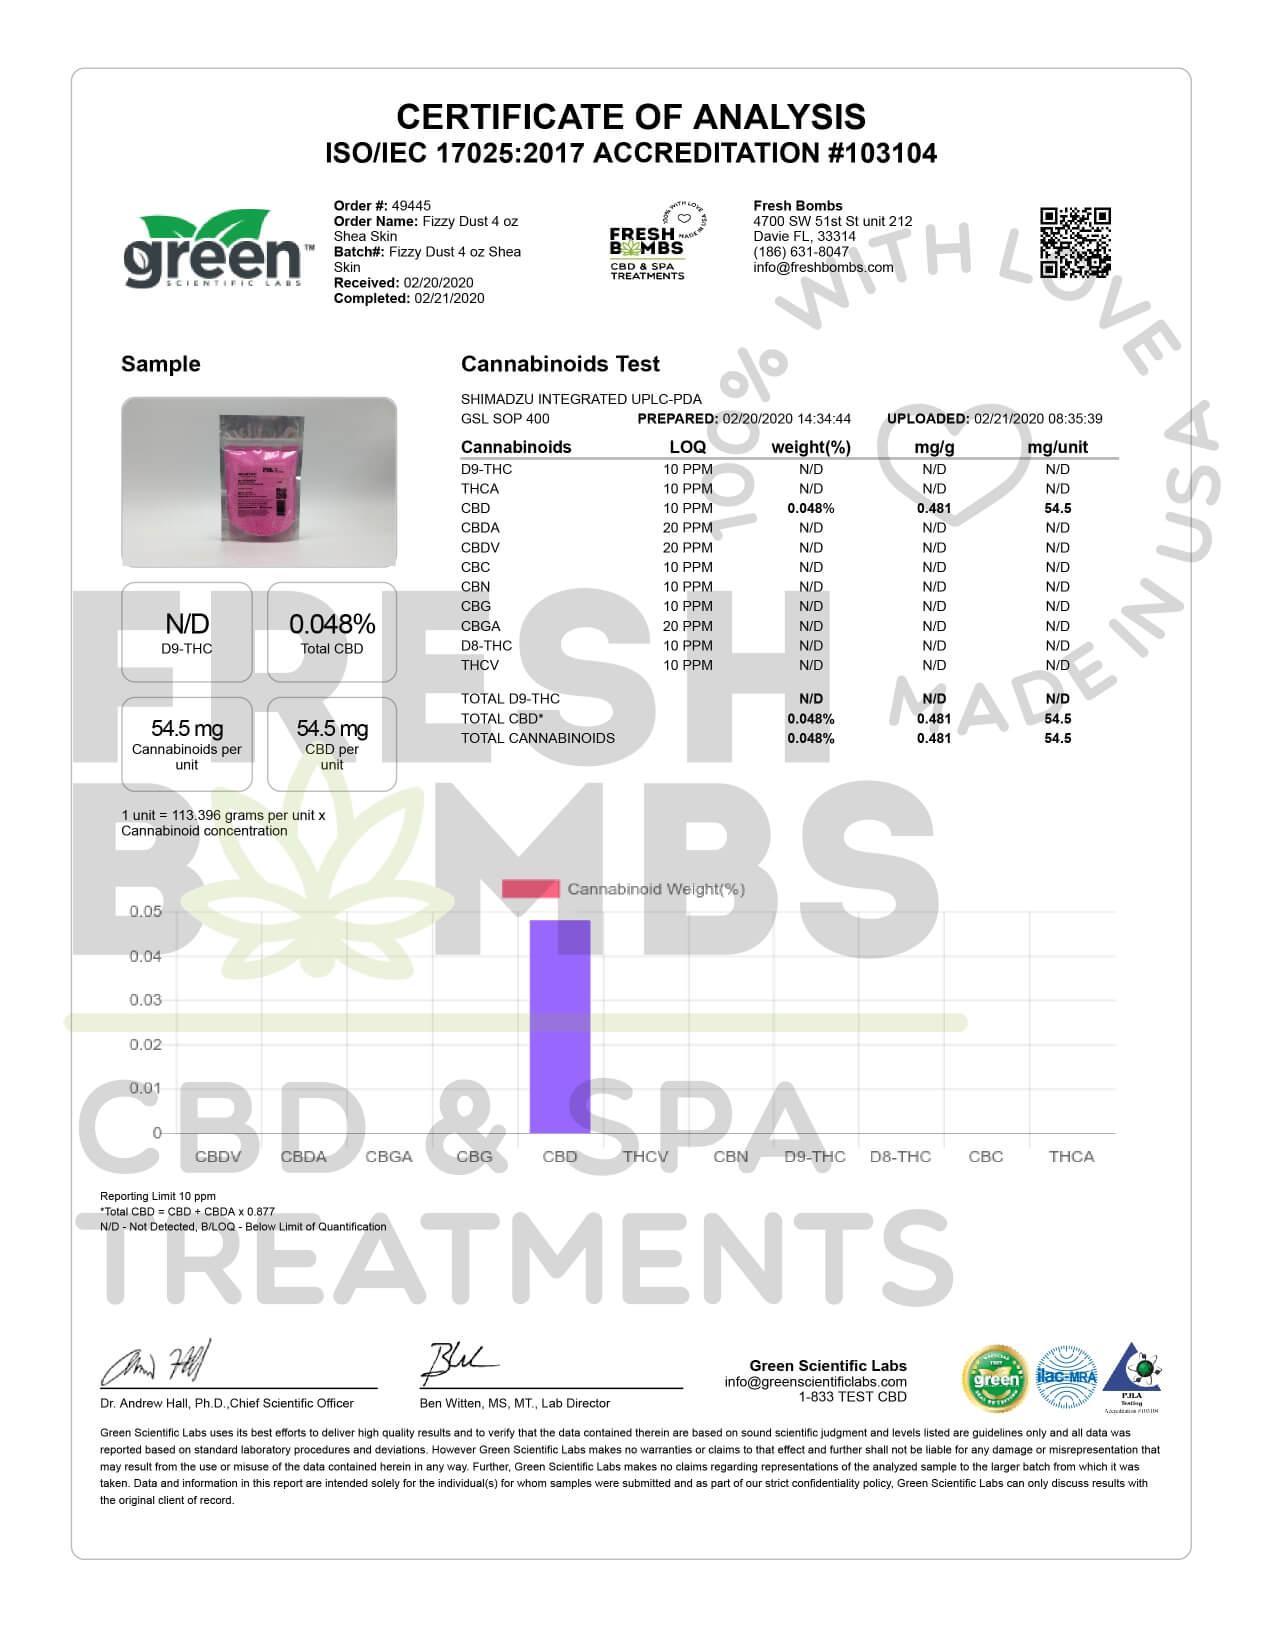 Fresh Bombs CBD Bath Shea Skin Healer Fizzy Dust 50mg Lab Report